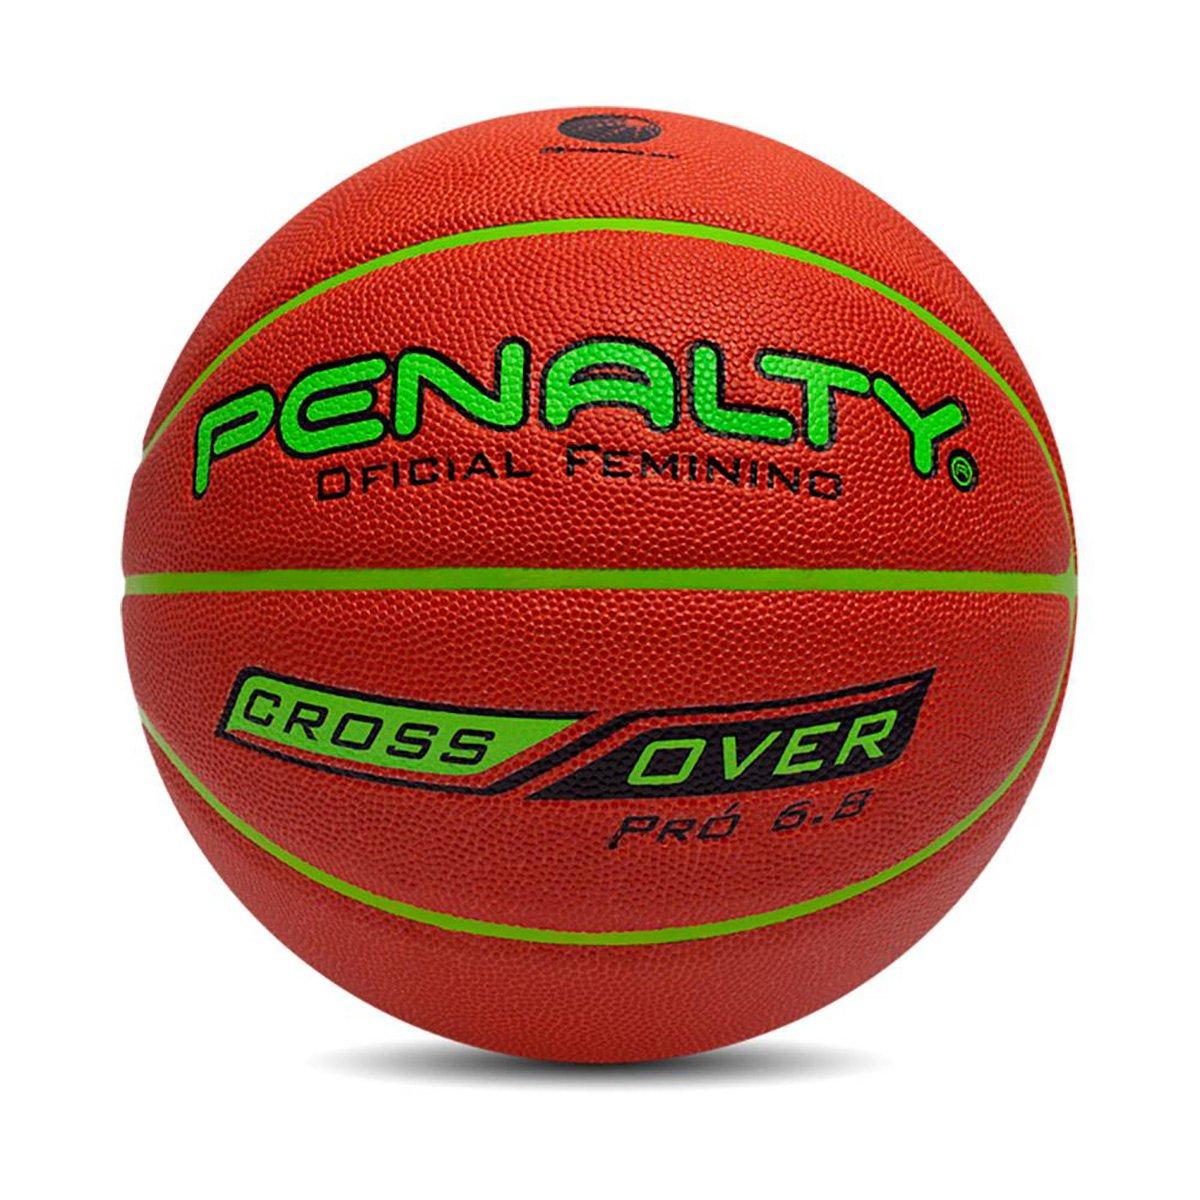 Bola de Basquete Penalty Crossover X 6.8 Pró